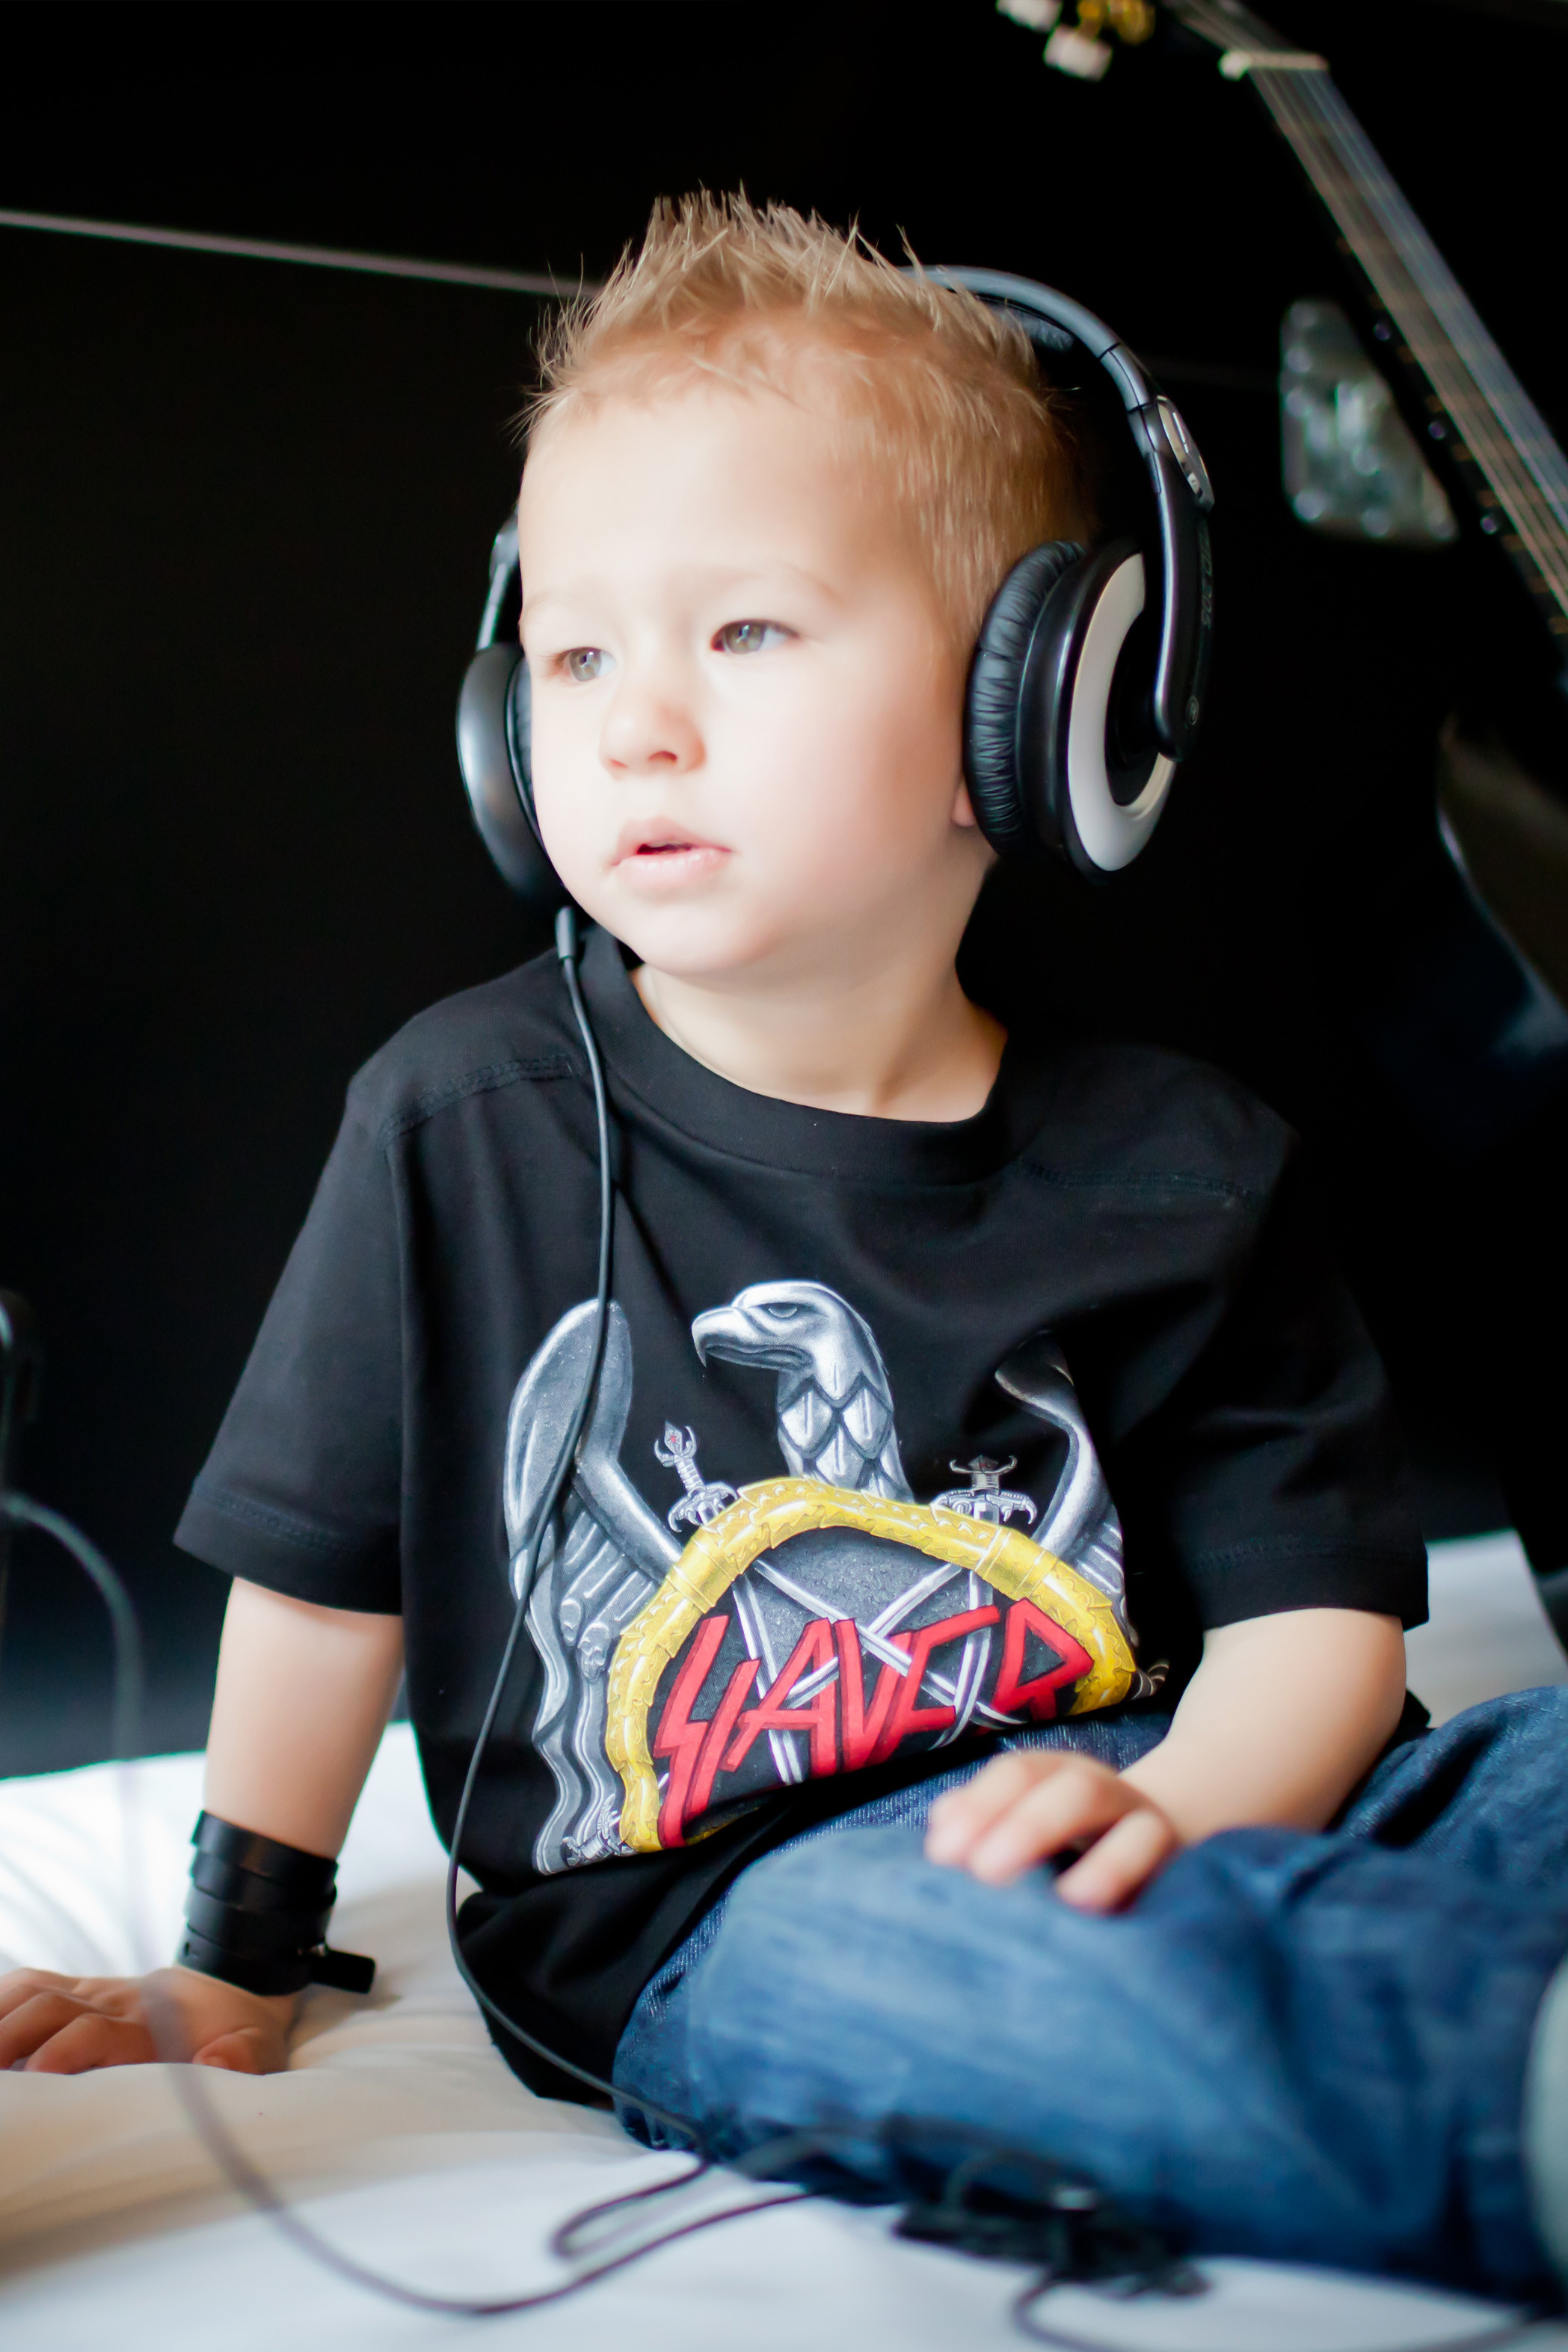 Slayer enfant merchandise Silver Eagle